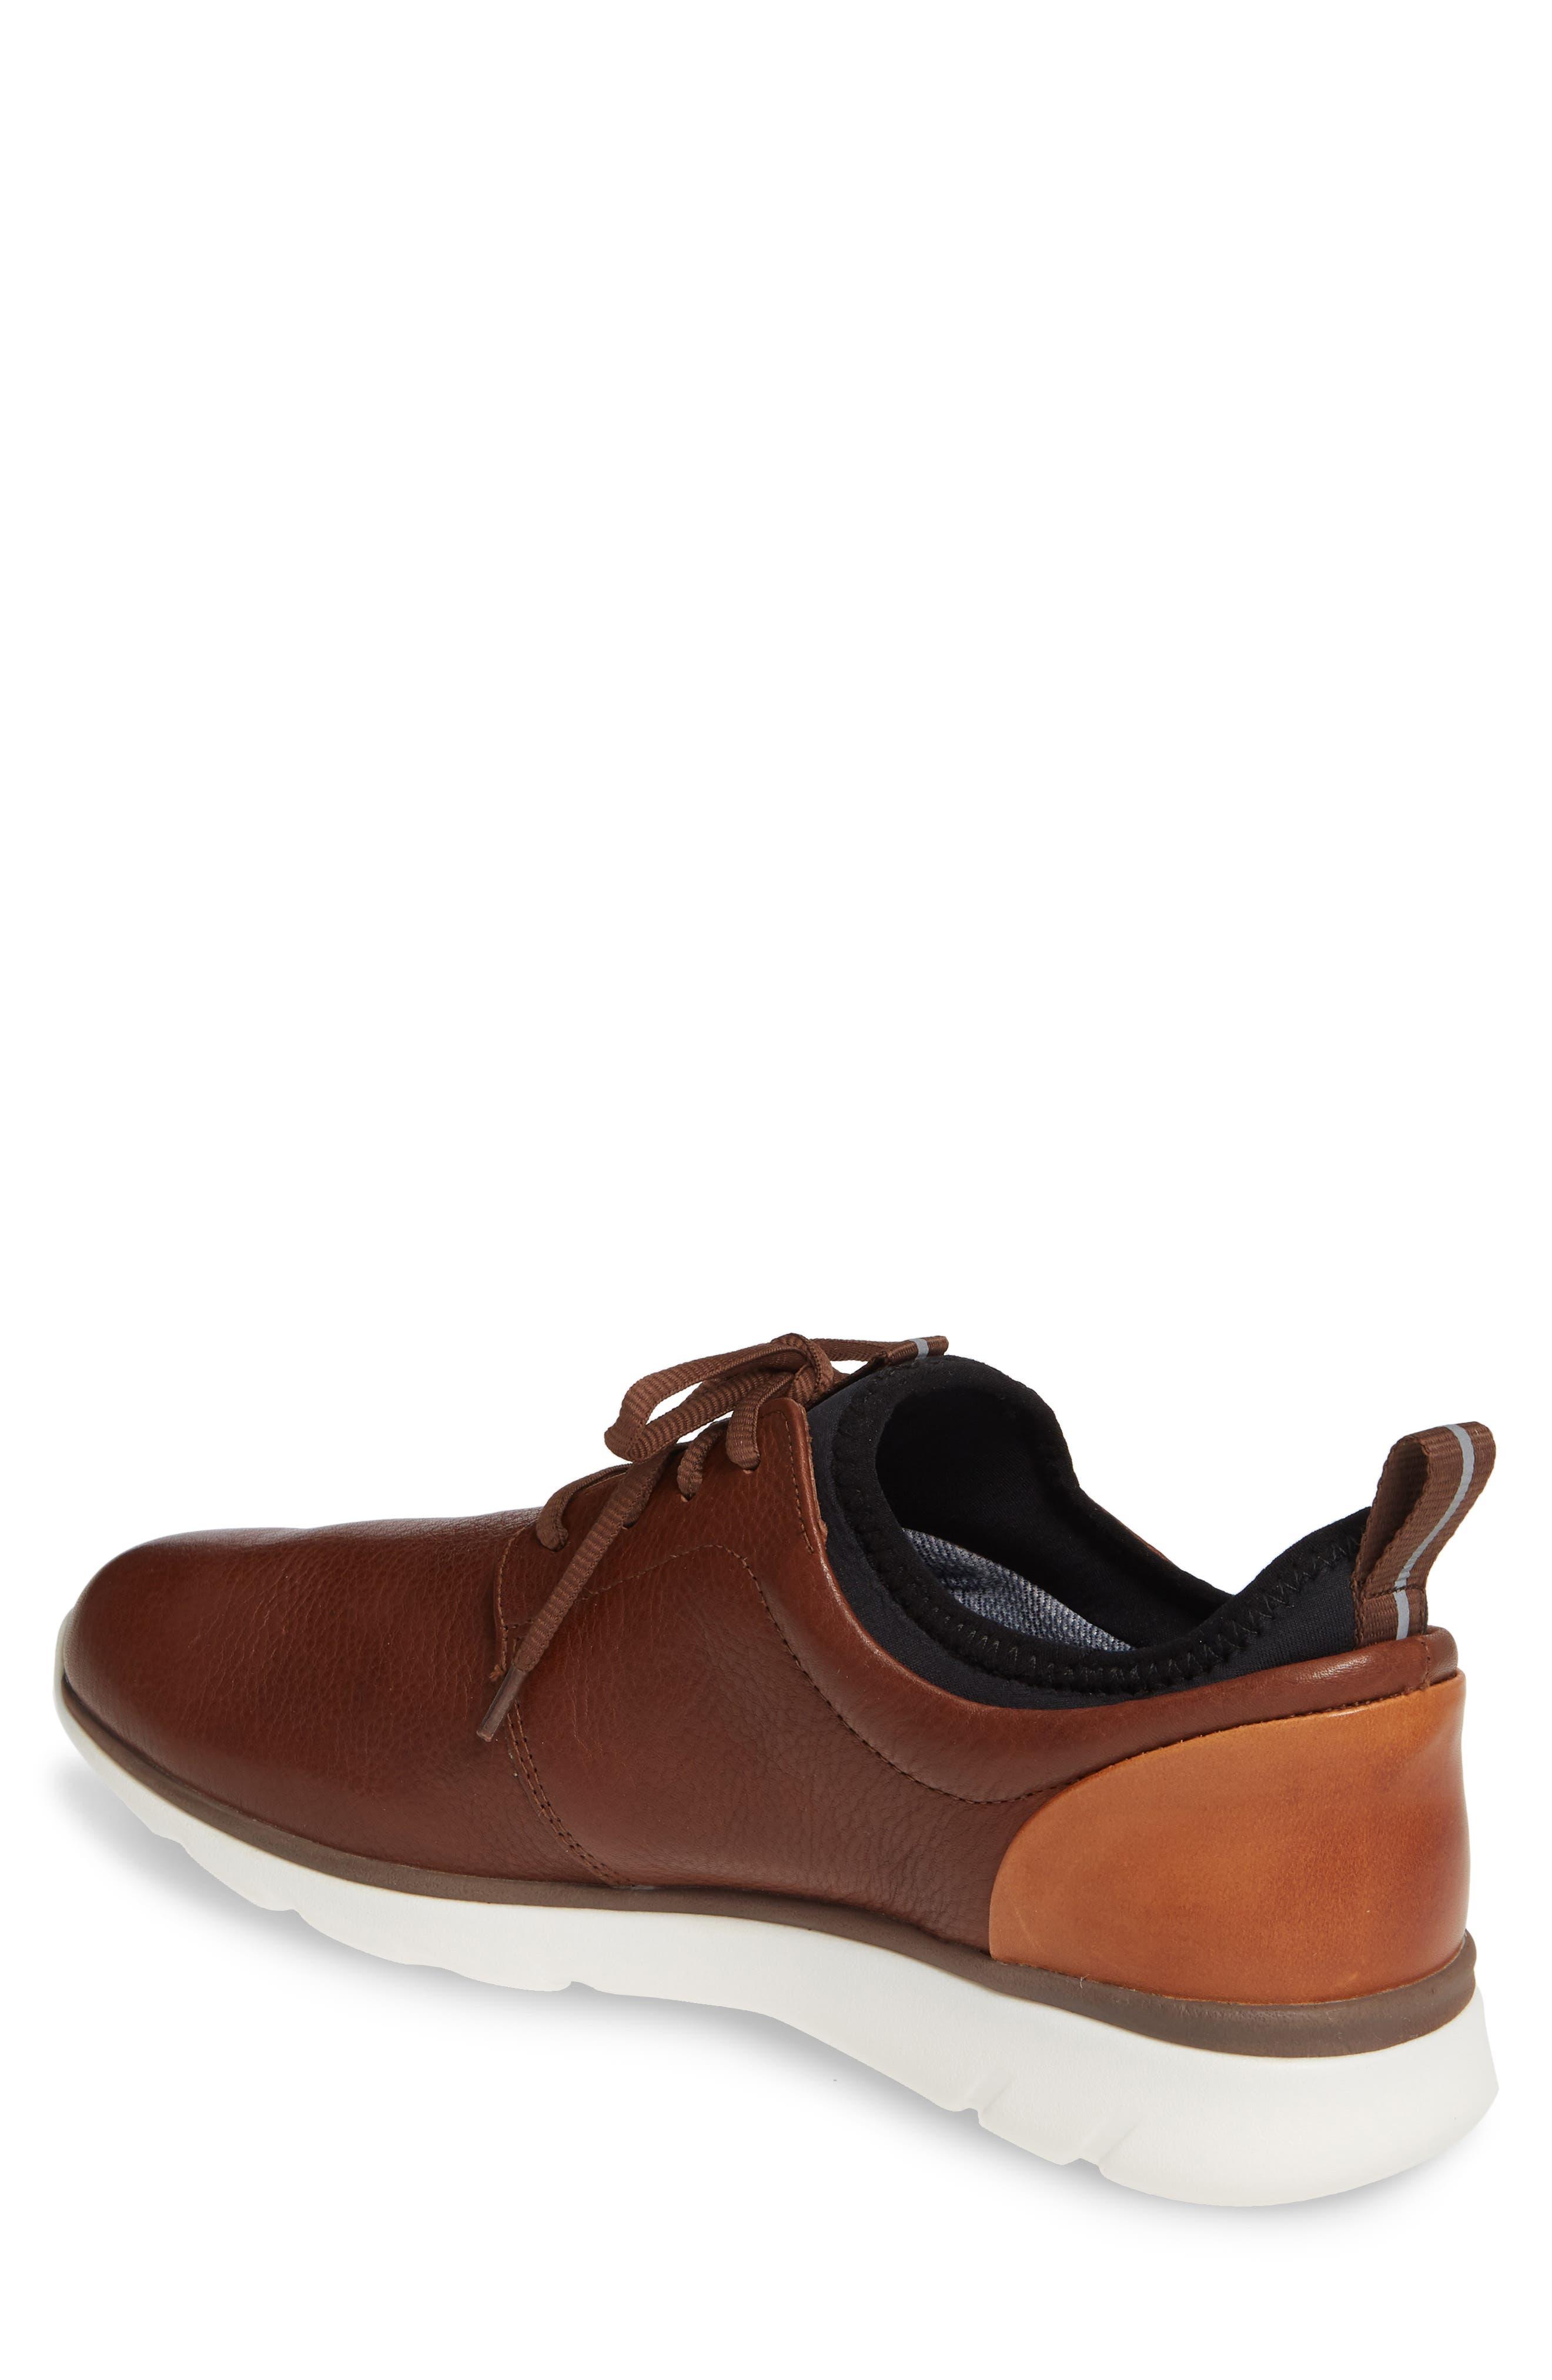 JOHNSTON & MURPHY, Prentiss XC4<sup>®</sup> Waterproof Low Top Sneaker, Alternate thumbnail 2, color, MAHOGANY LEATHER